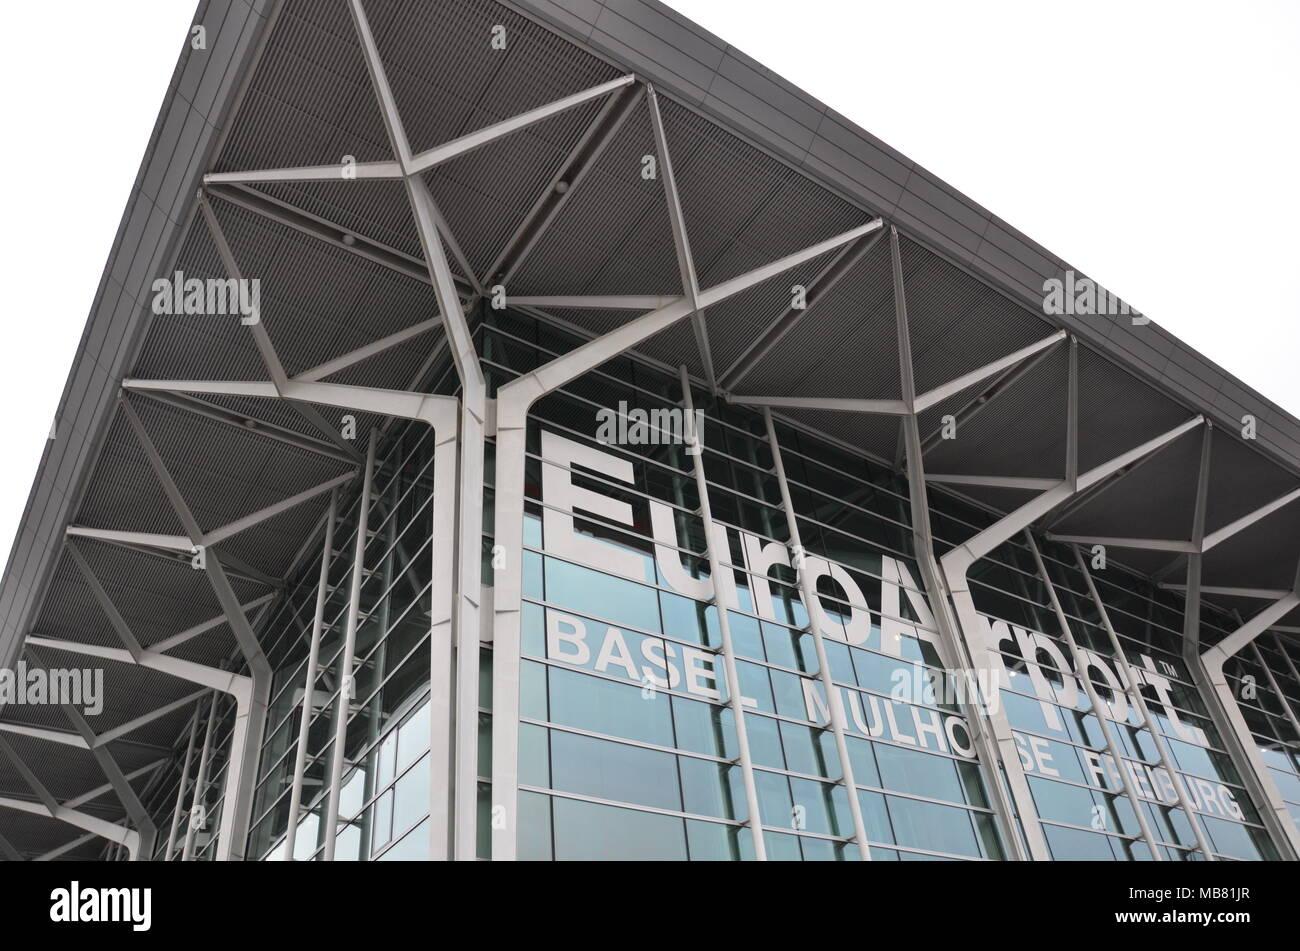 The terminal building of EuroAirport (Basel, Mulhouse, Freiburg), Basel, Switzerland, January 2018 Stock Photo